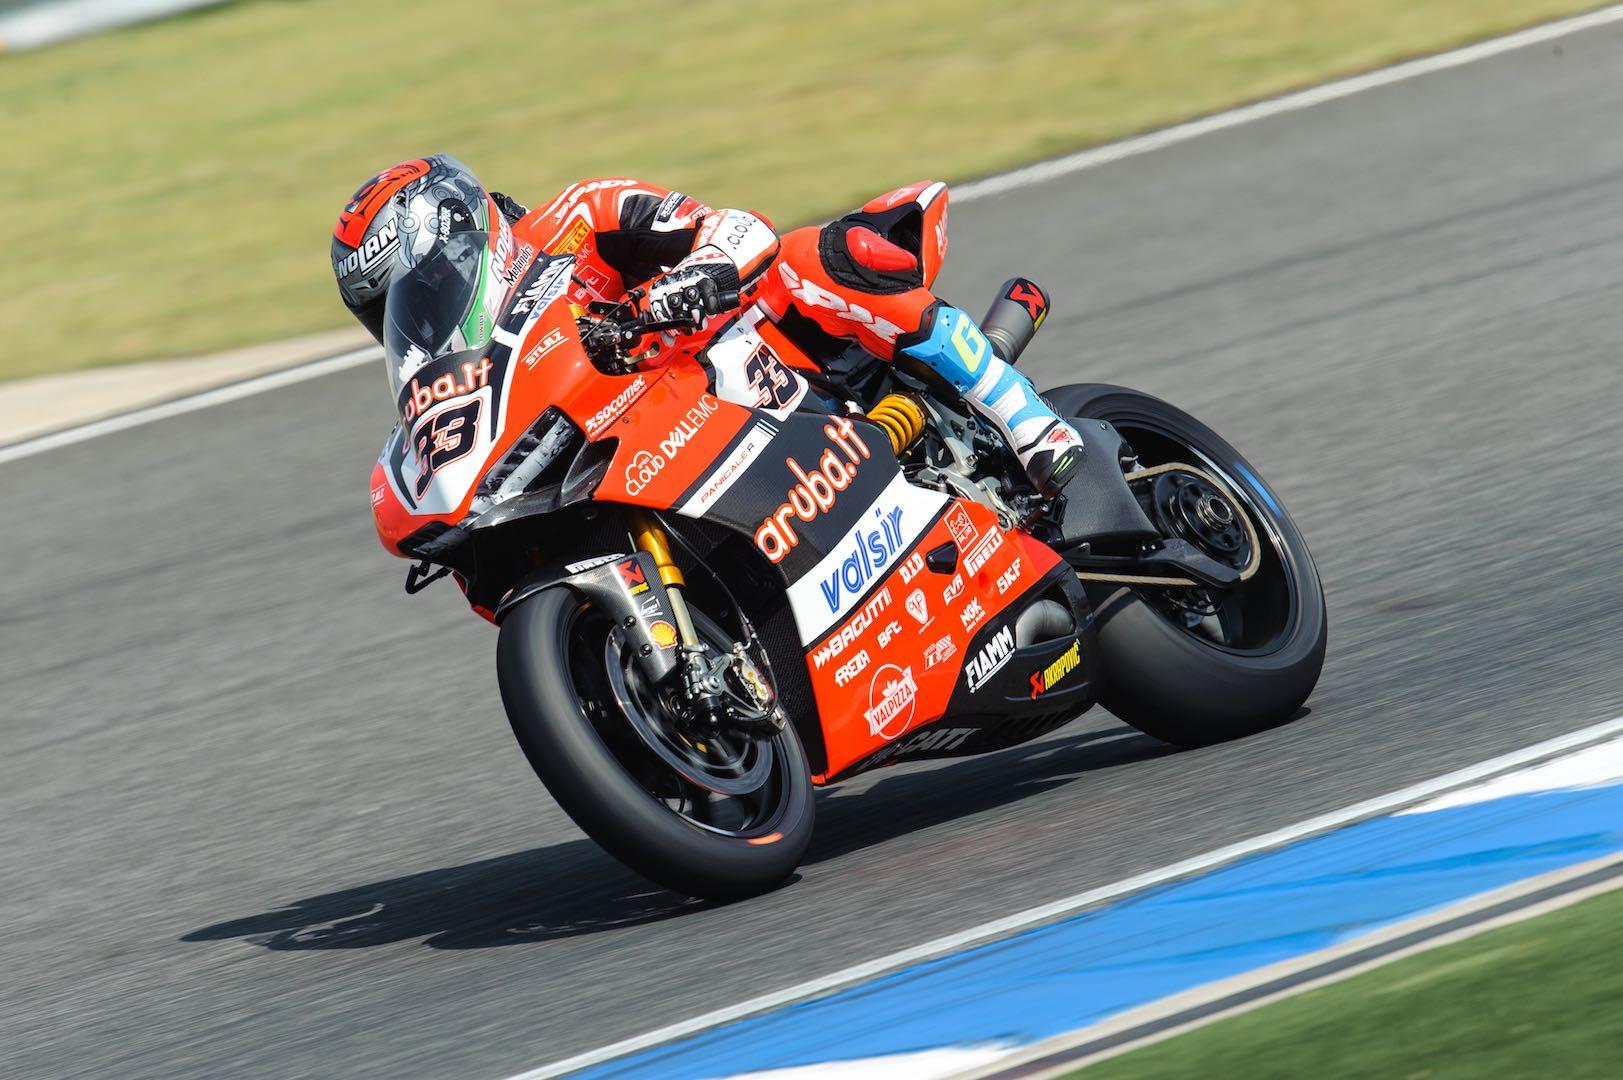 2017 Thailand World Superbike Friday Practice: Ducati's Marco Melandri